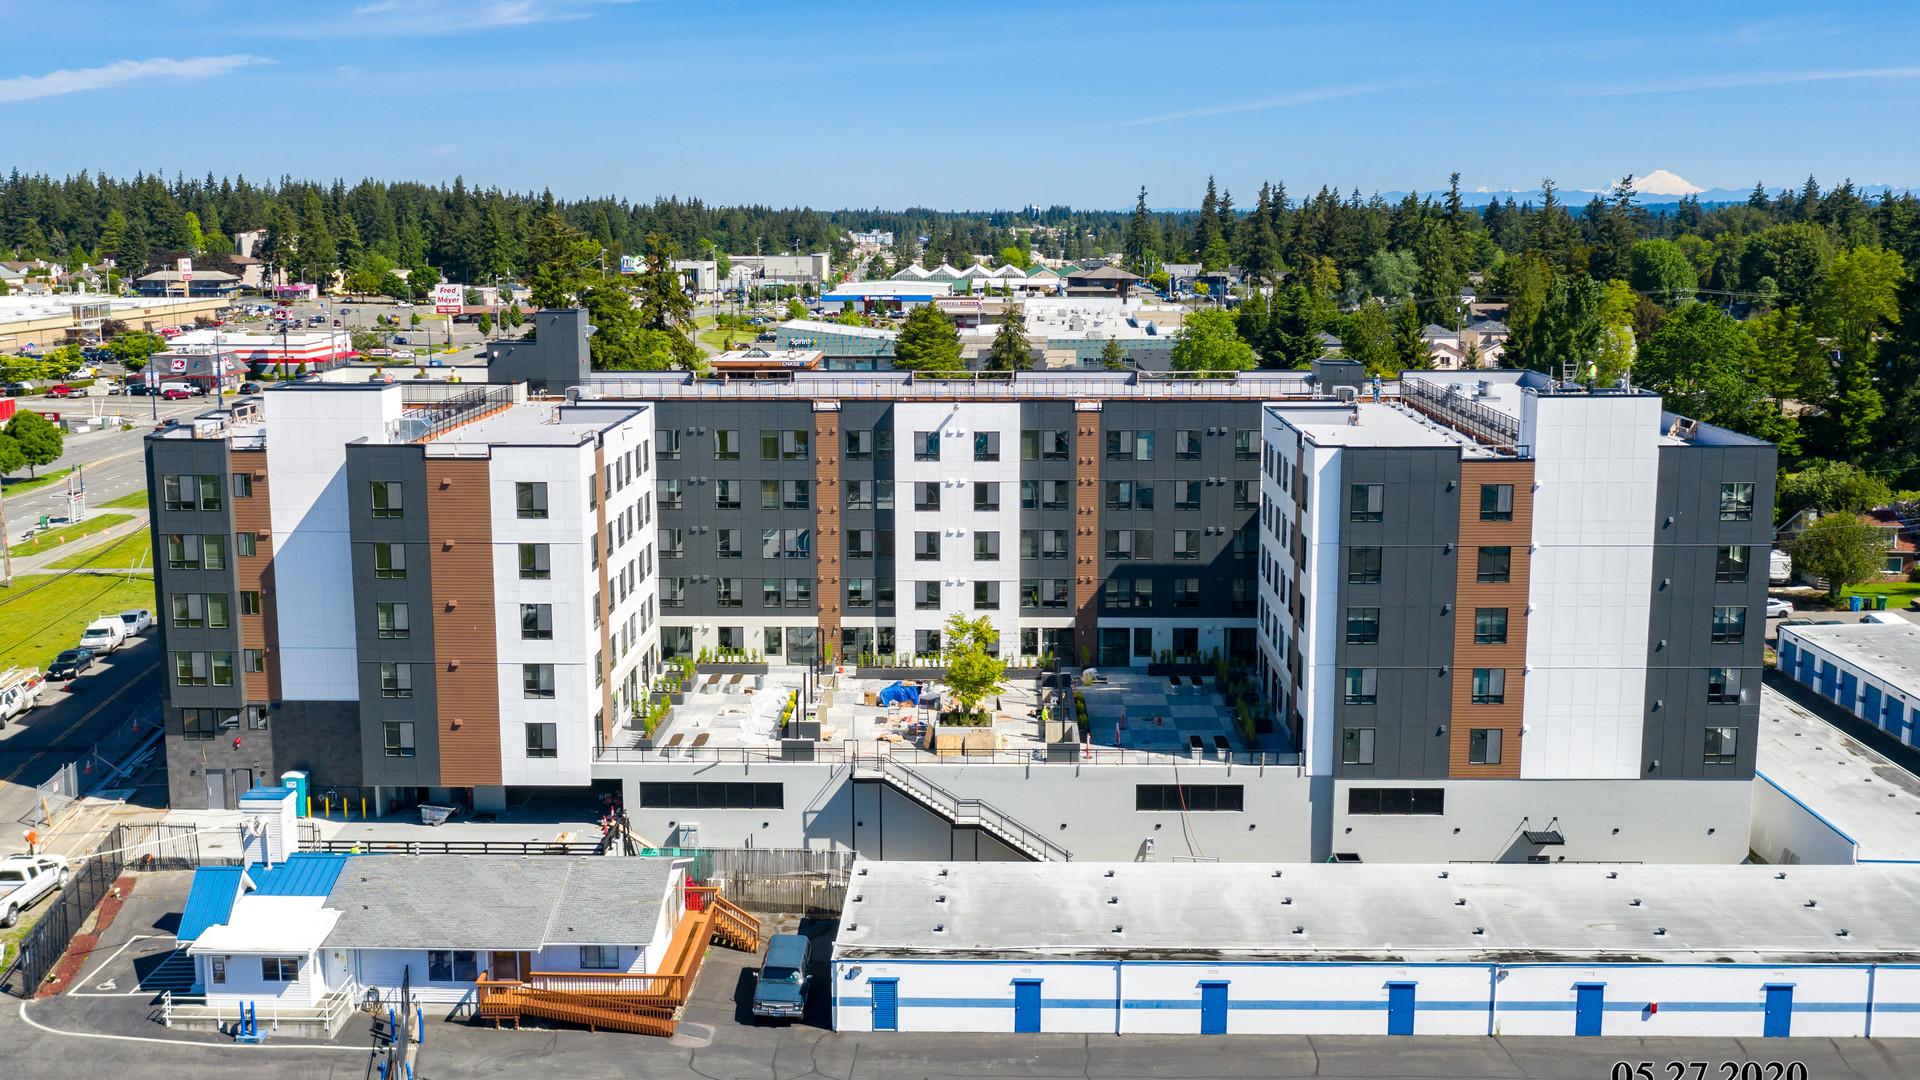 Vail Apartments (Shoreline, WA)